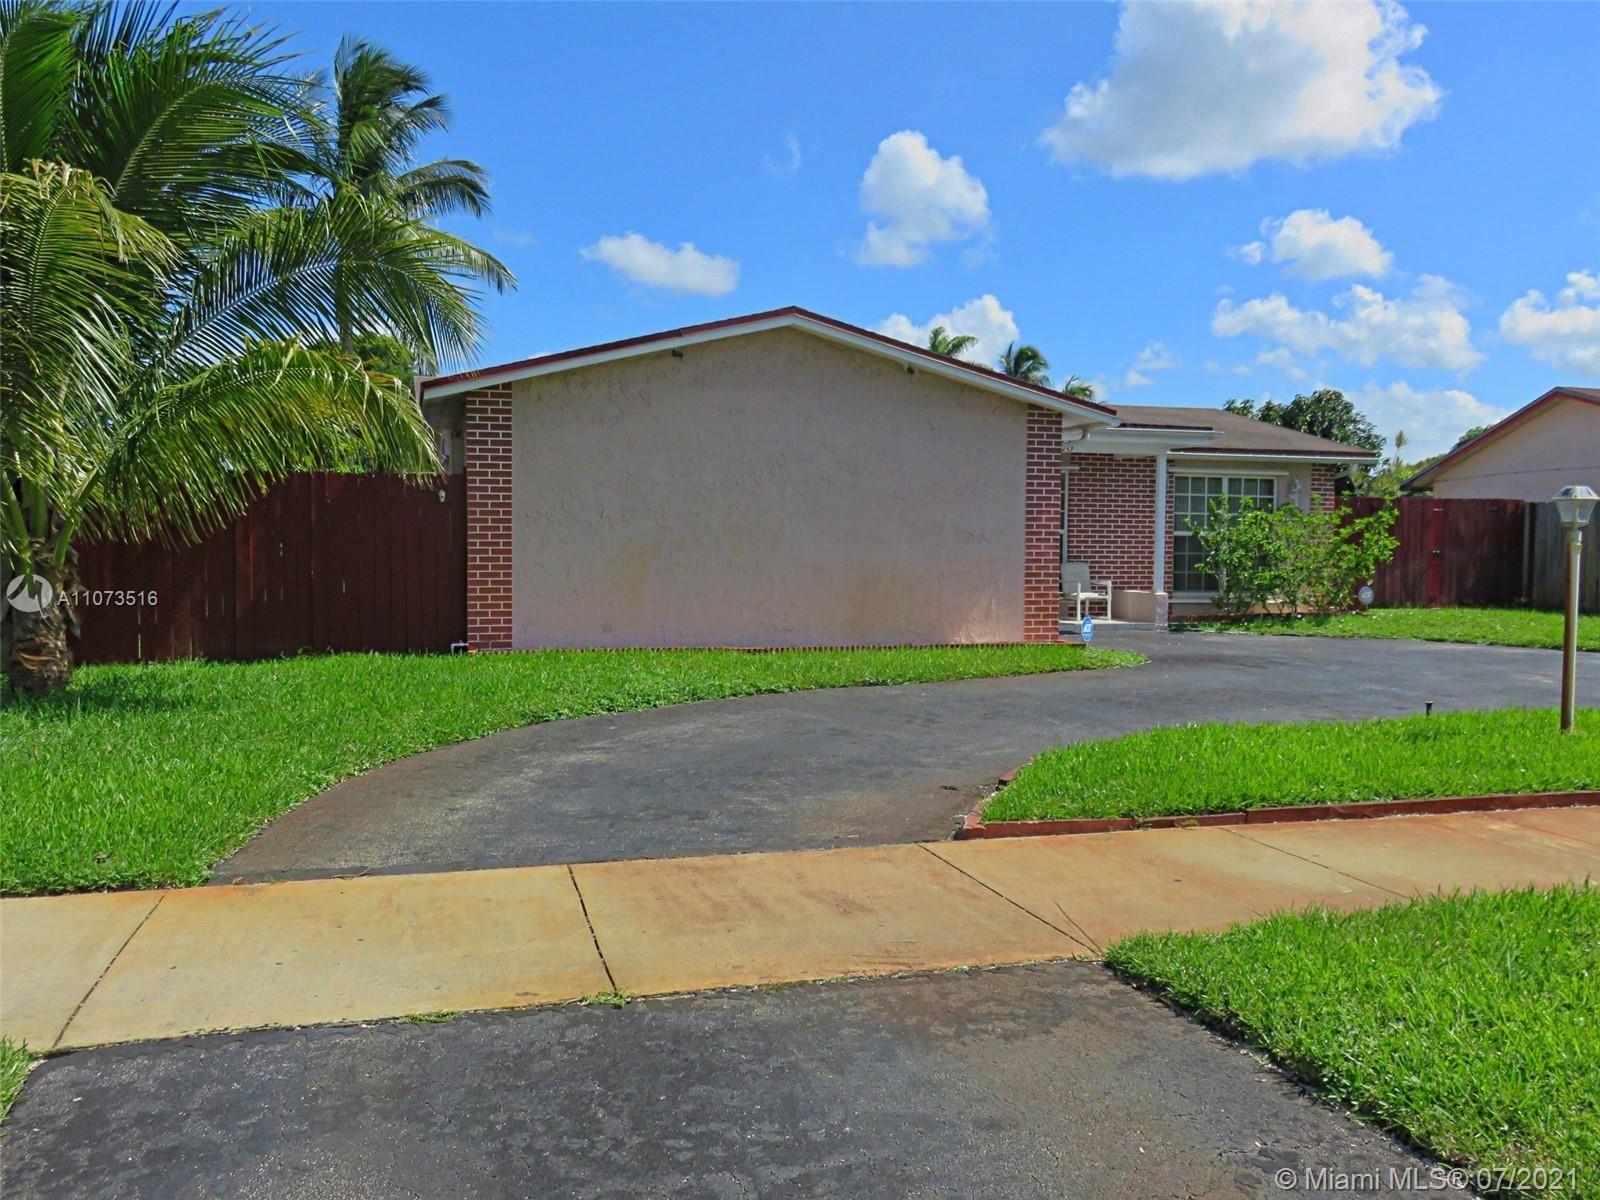 Photo of 8650 Johnson St, Pembroke Pines, FL 33024 (MLS # A11073516)